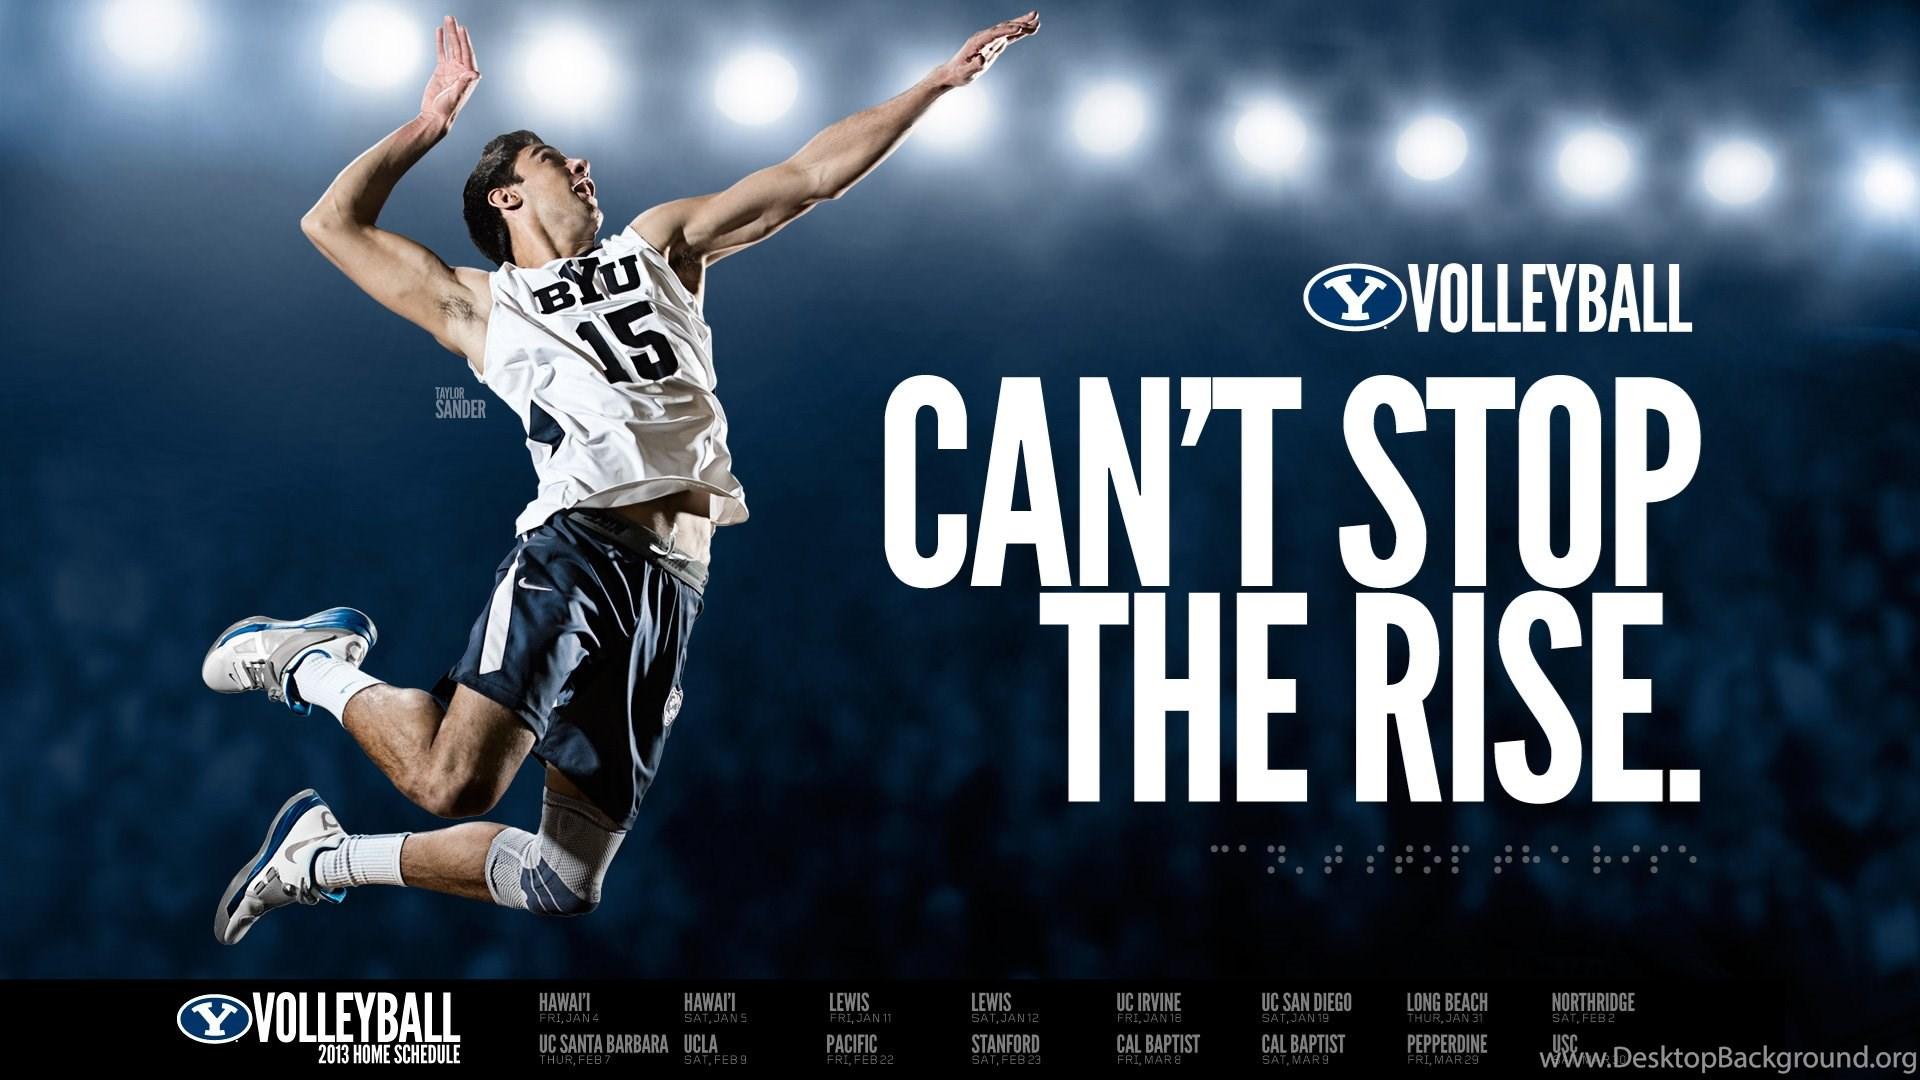 Volleyball Hd Wallpapers Desktop Background